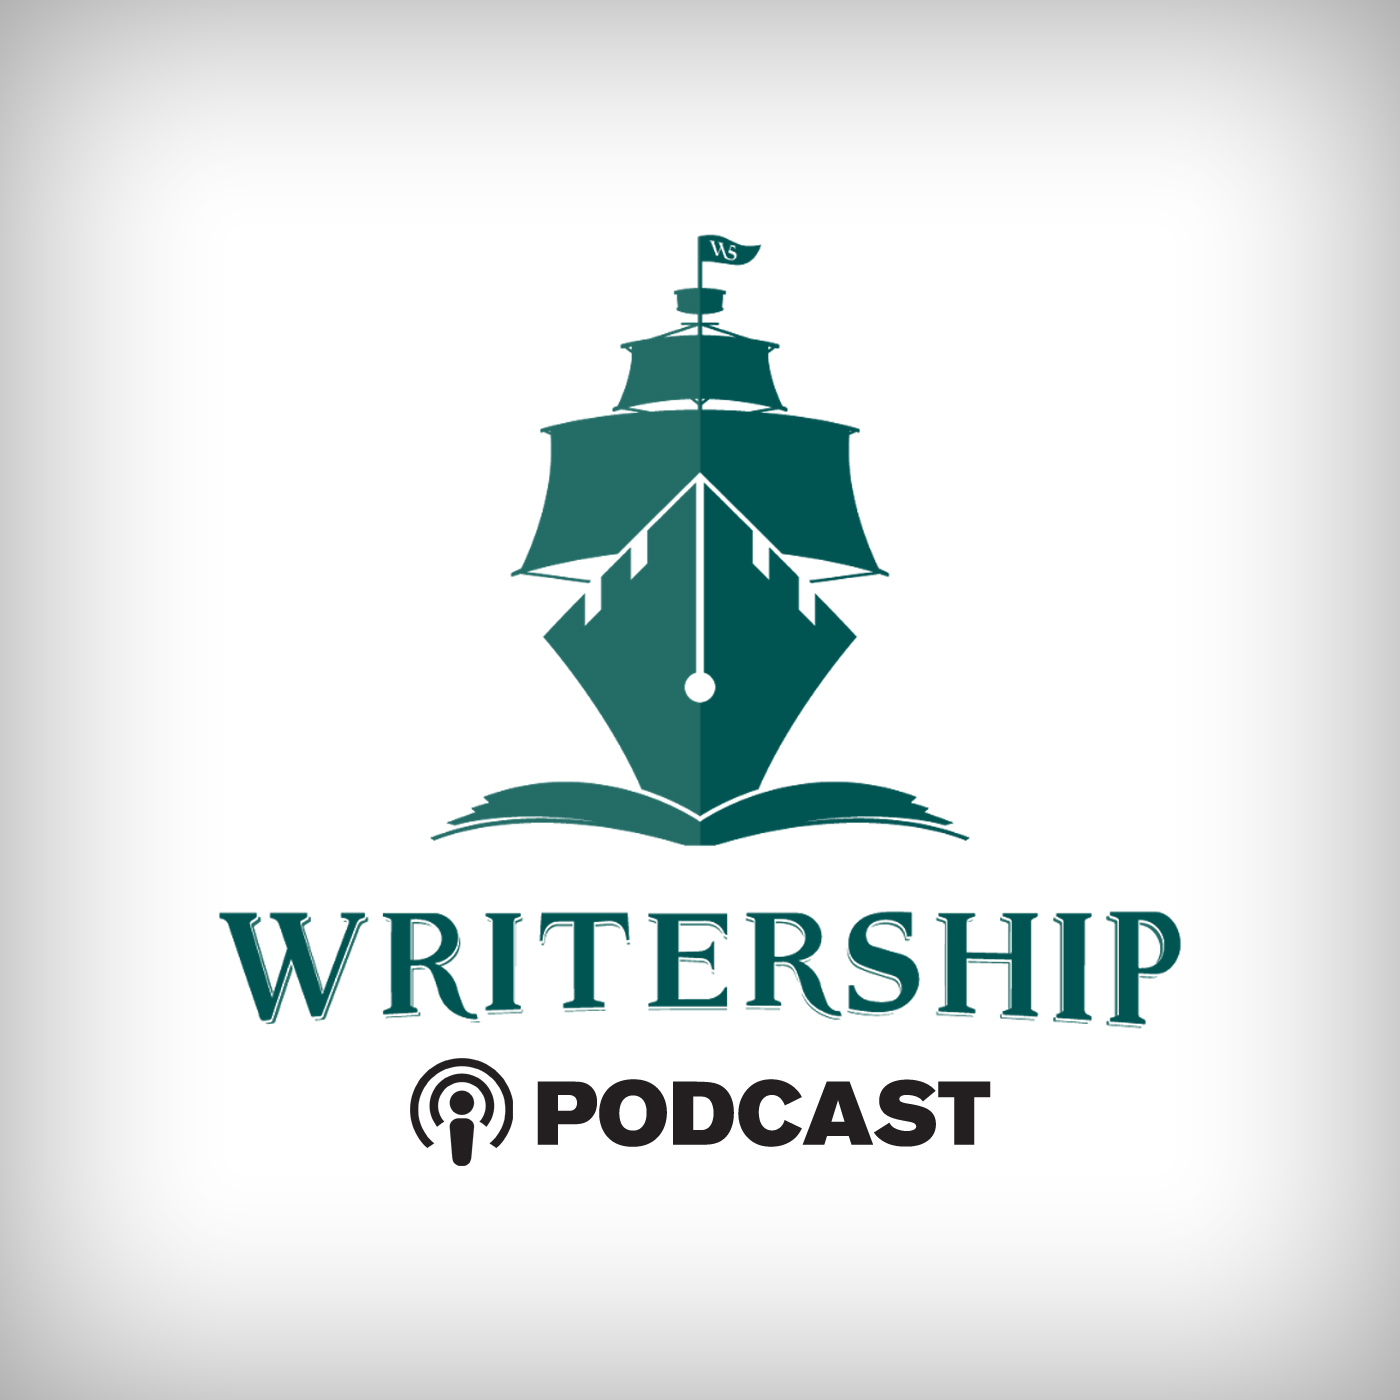 writership-podcast1400.jpg